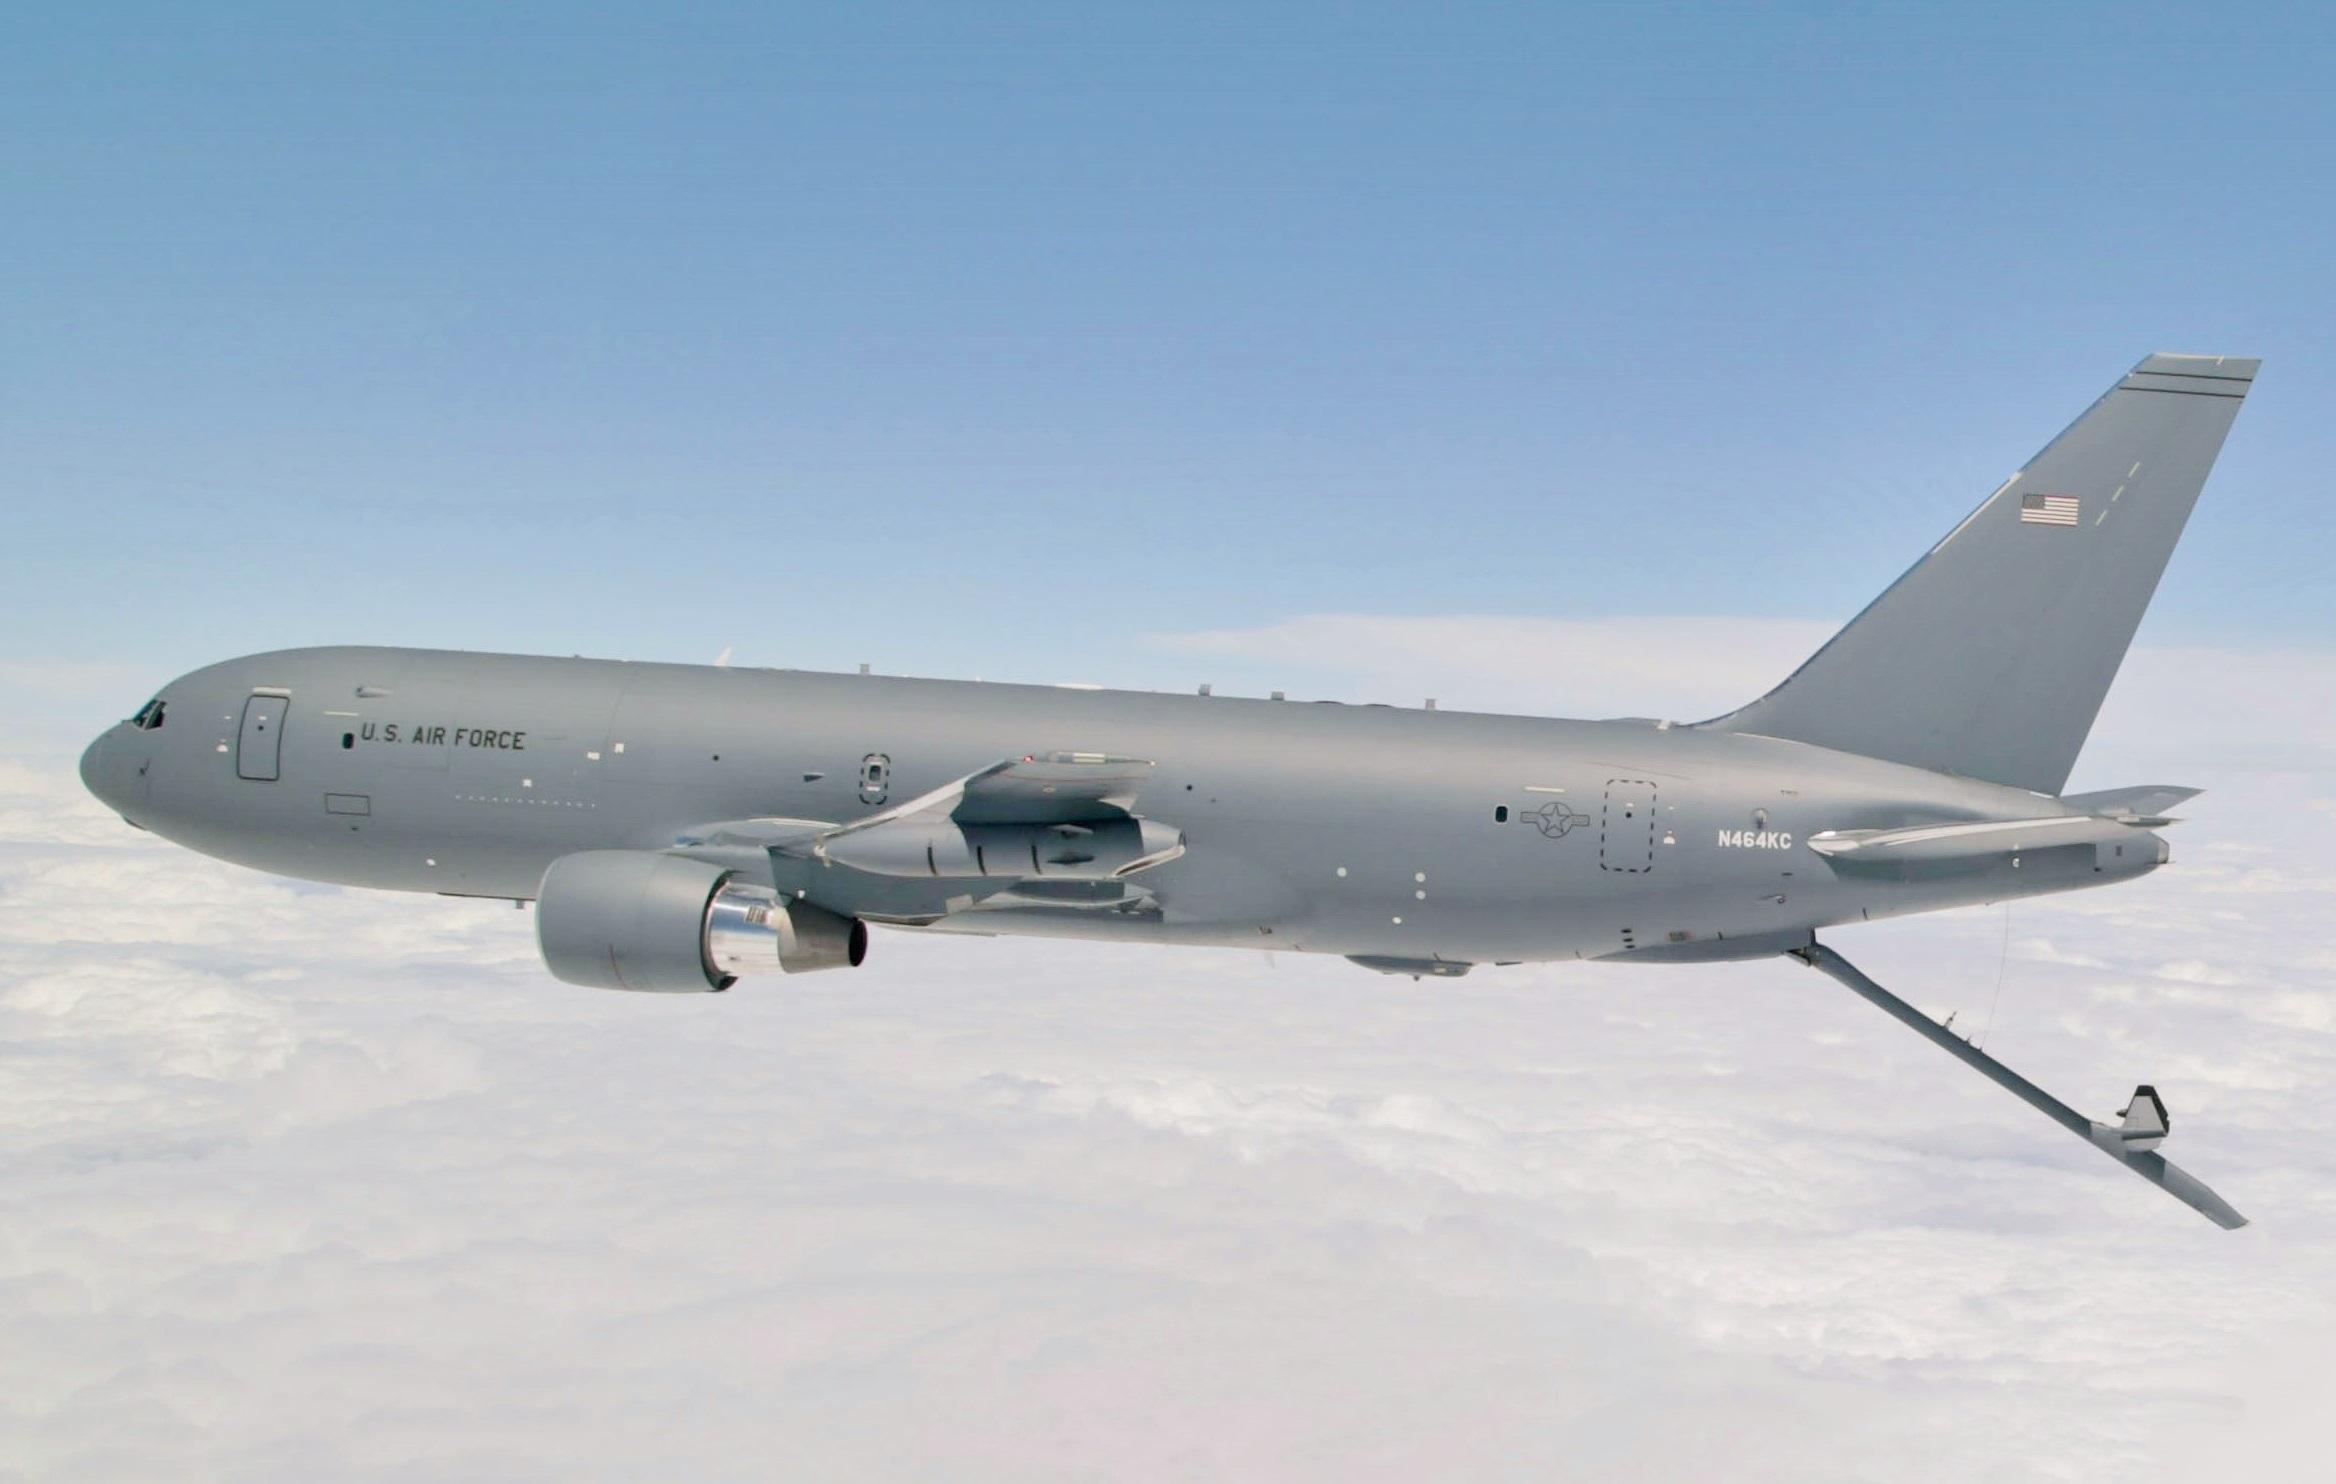 If This Plane Doesn't Fly F-22s and F-15s Don't Fly.